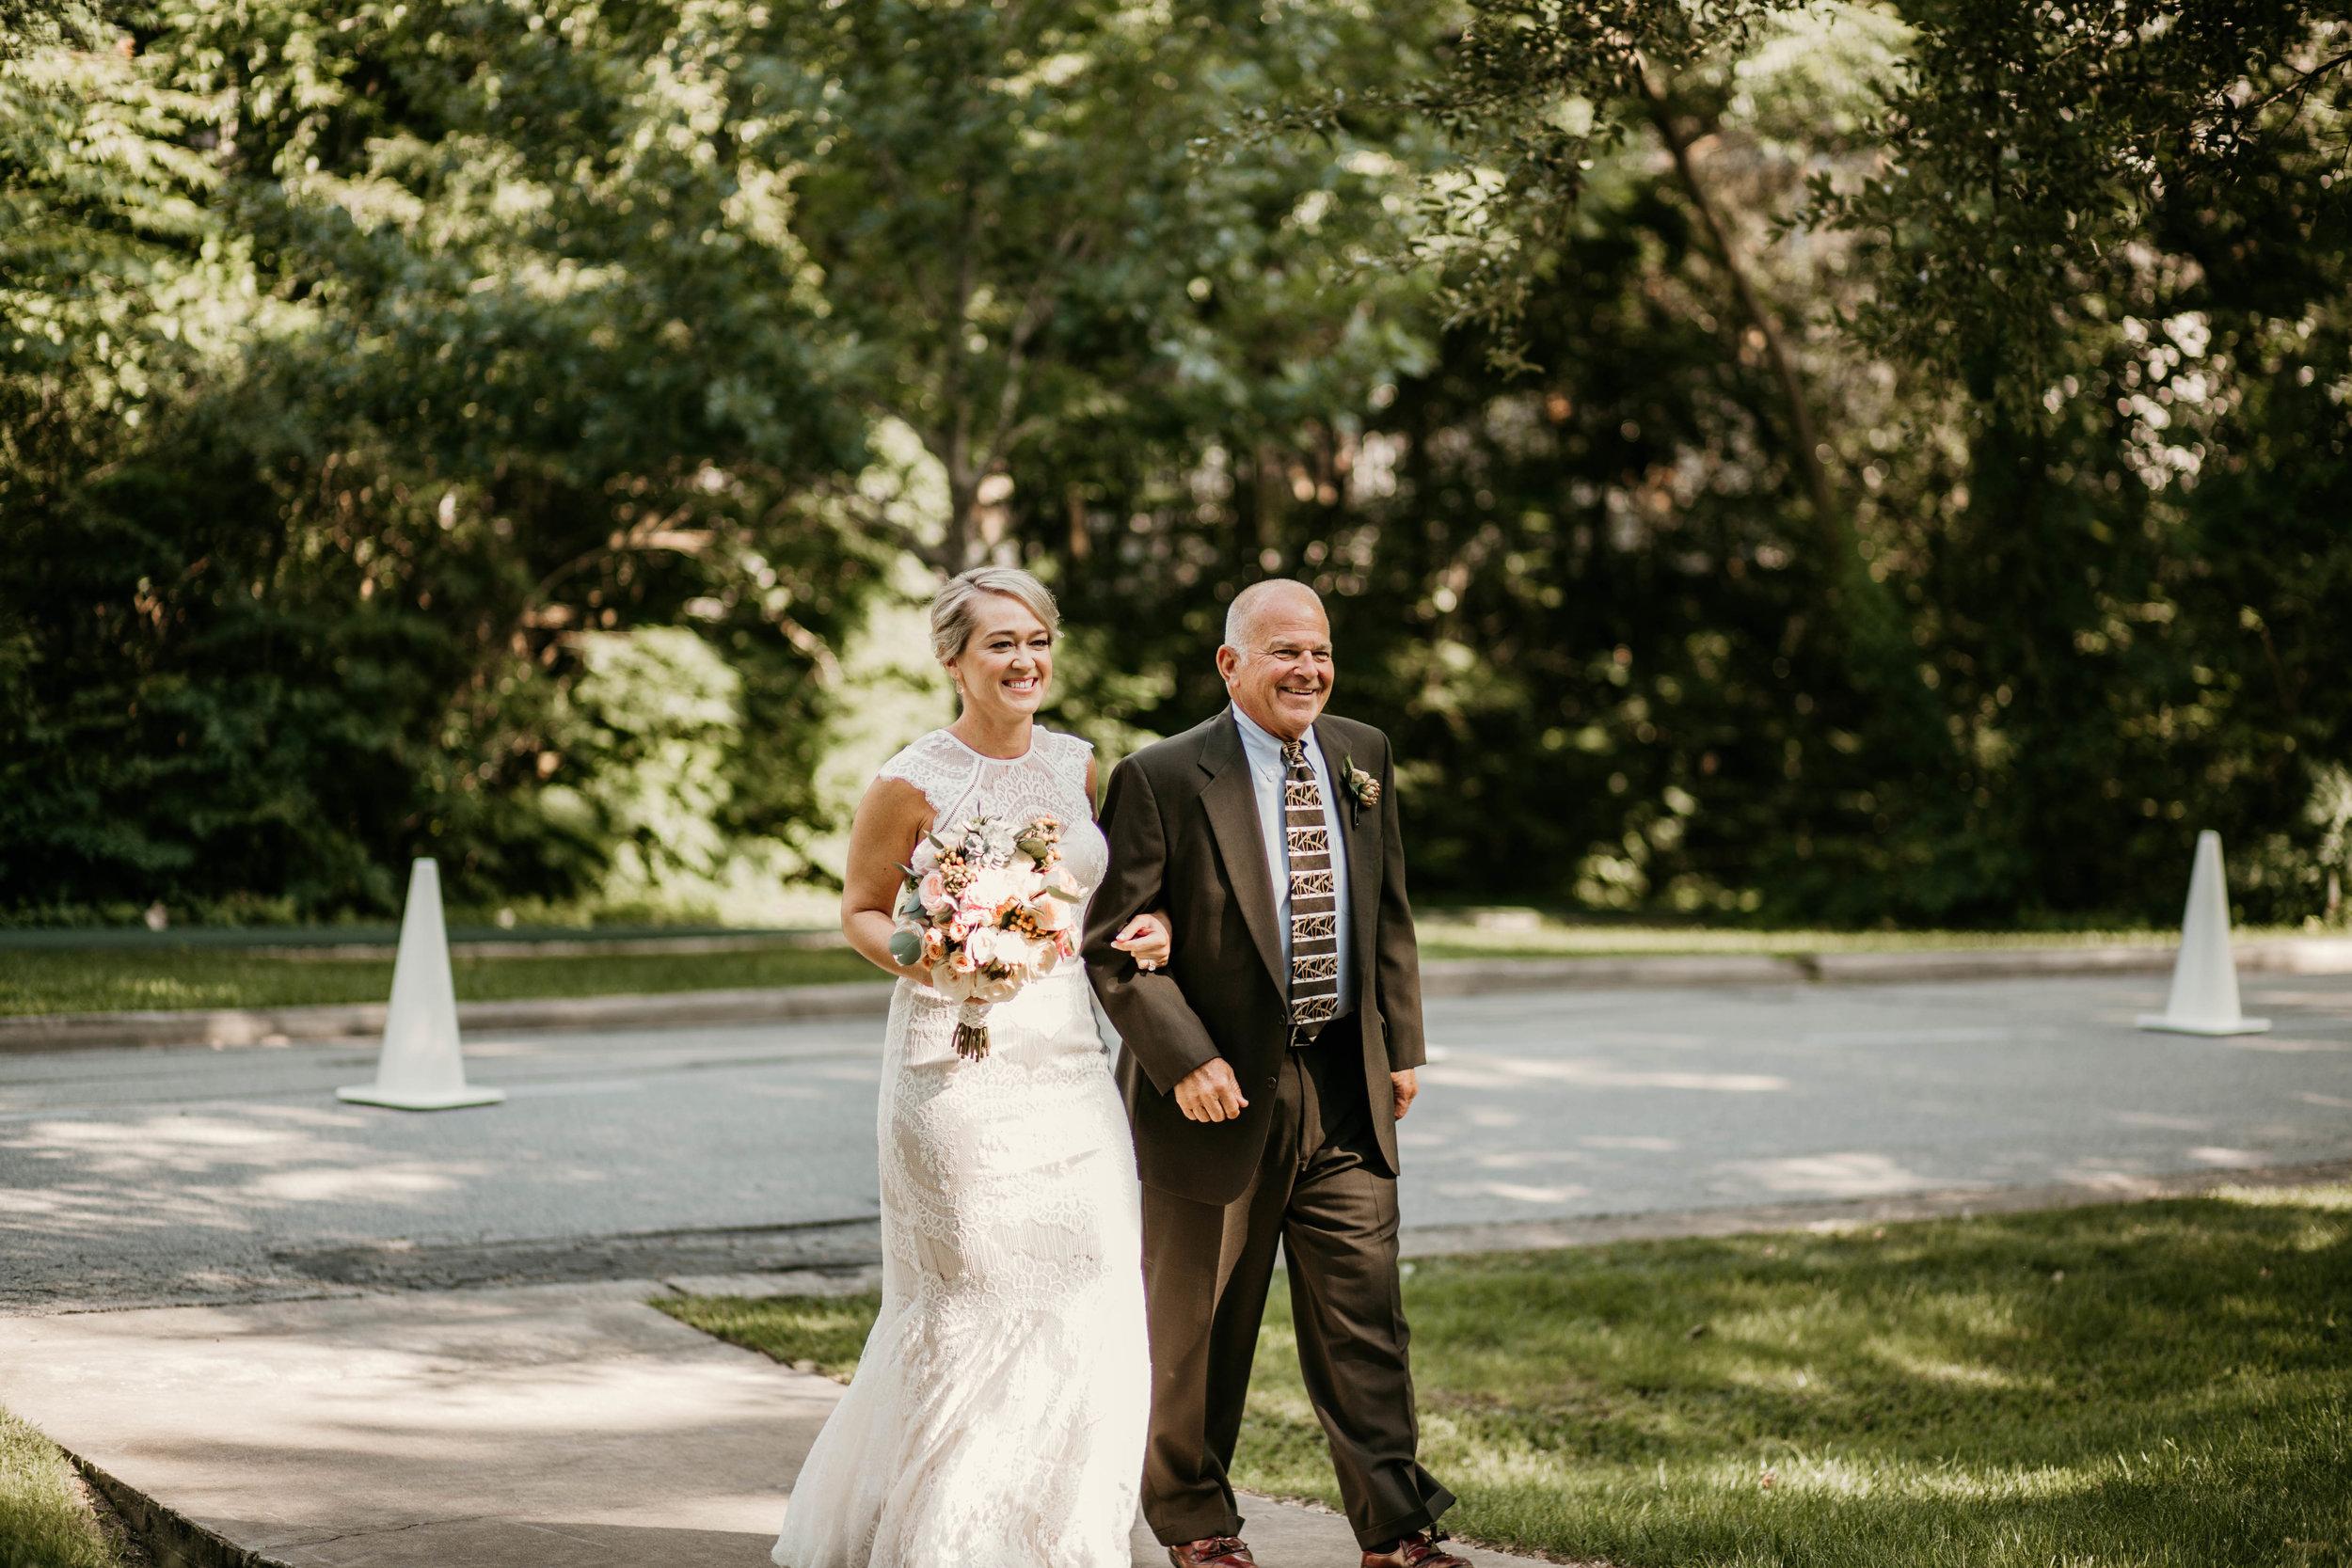 angie-carlton-the-manor-house-houston-wedding-16.jpg